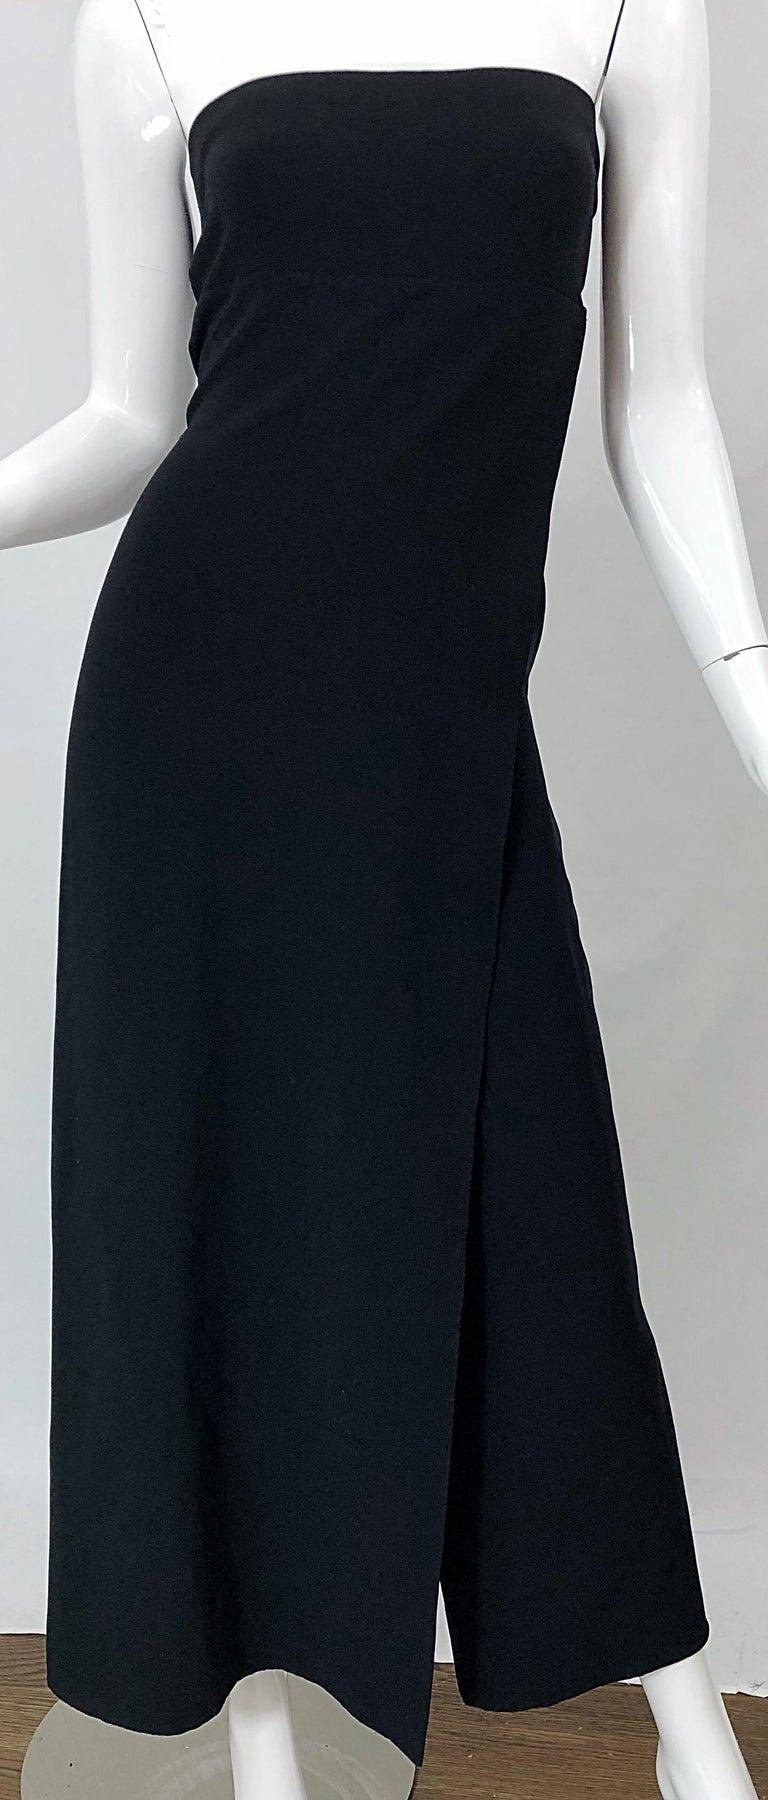 1990s Donna Karan New York Size 4 Black Strapless Vintage 90s Gown Maxi Dress For Sale 3